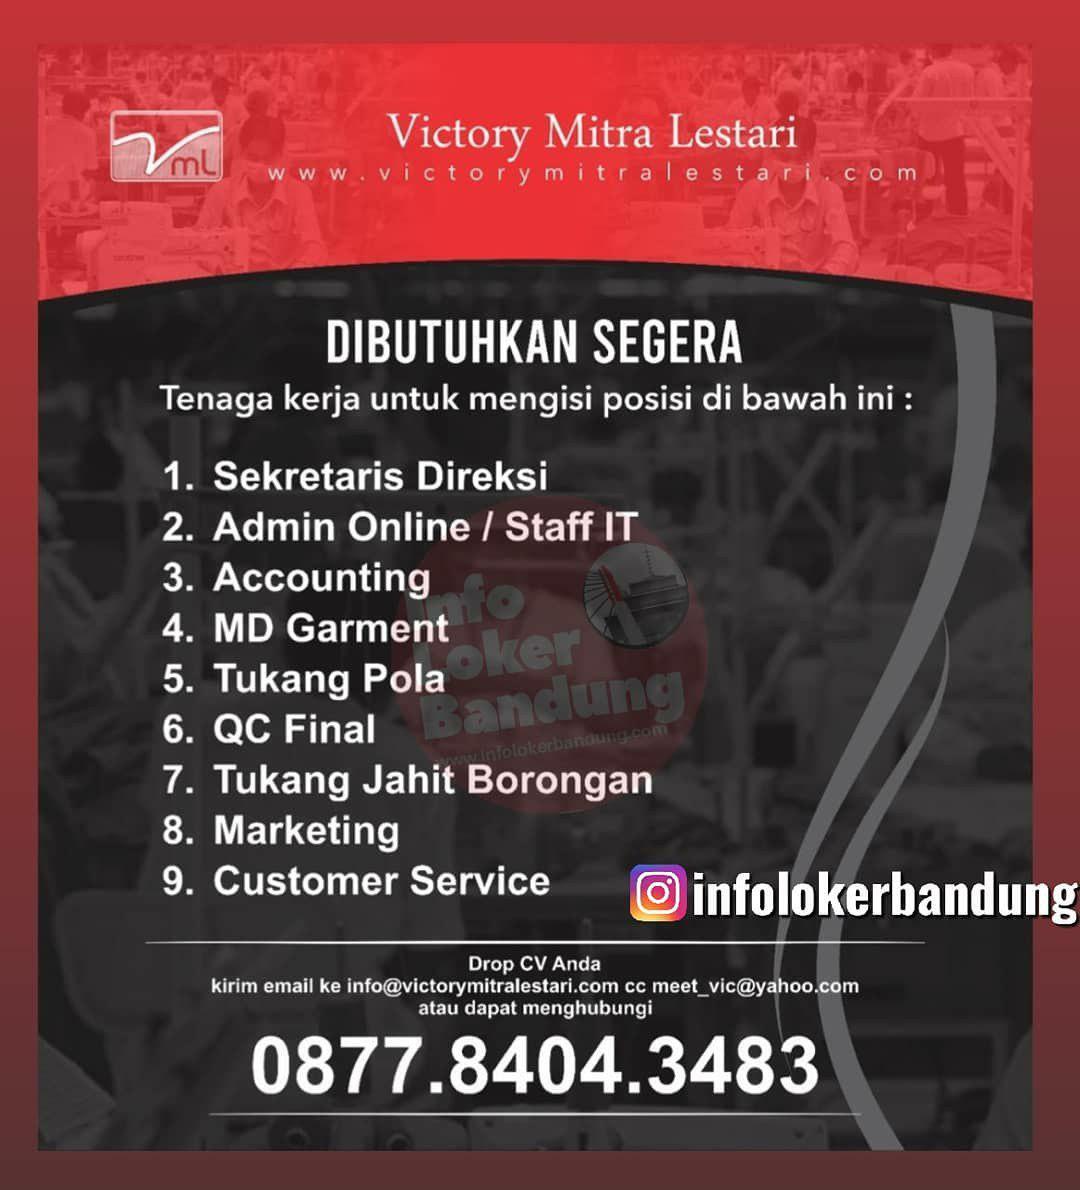 Lowongan Kerja CV. Victory Mitra Lestari Bandung Oktober 2019